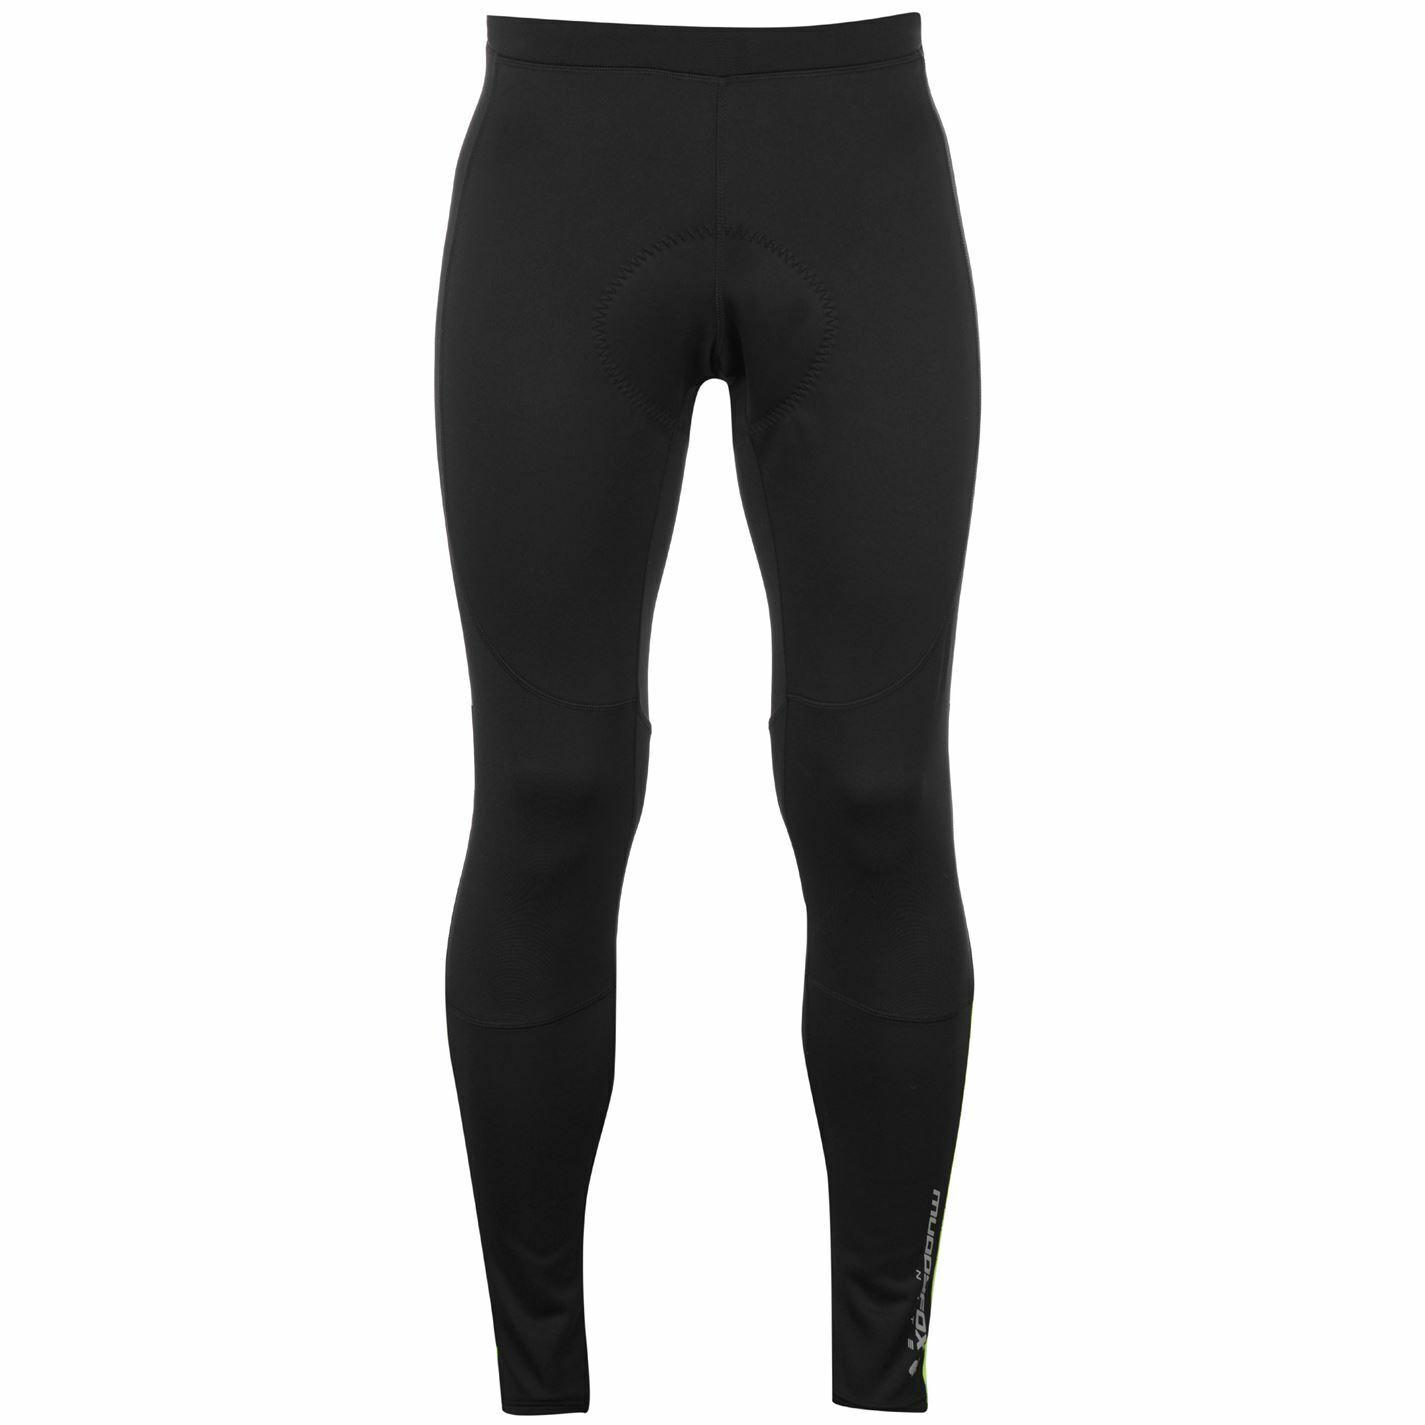 Muddyfox Nite Calzas Pantalones Pantalones Pantalones de ciclismo para hombre Caballeros sello ligero